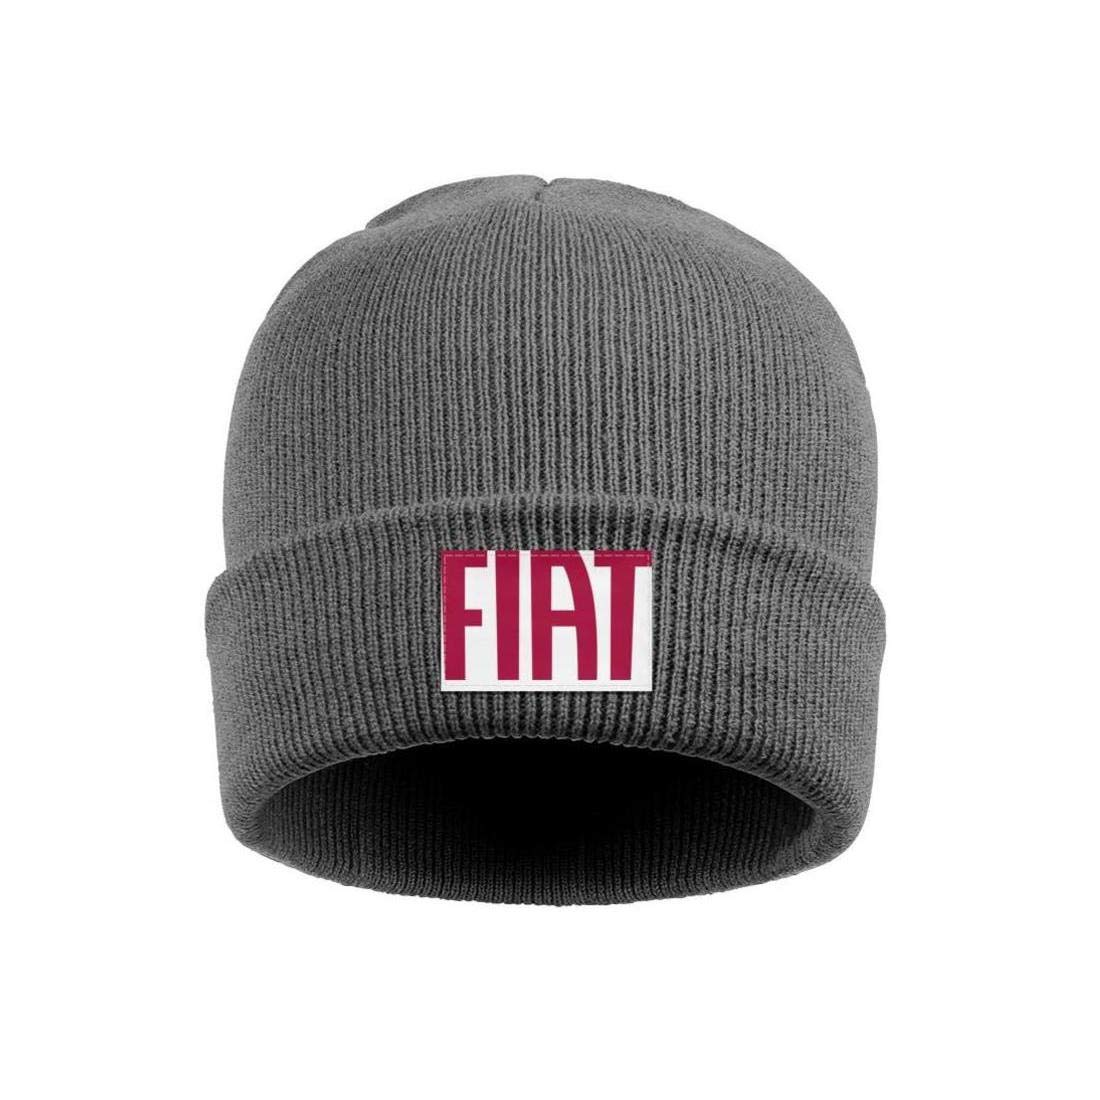 Mens Womens Beanie Hats Fiat-Automobiles-Logo Winter Knit Cap